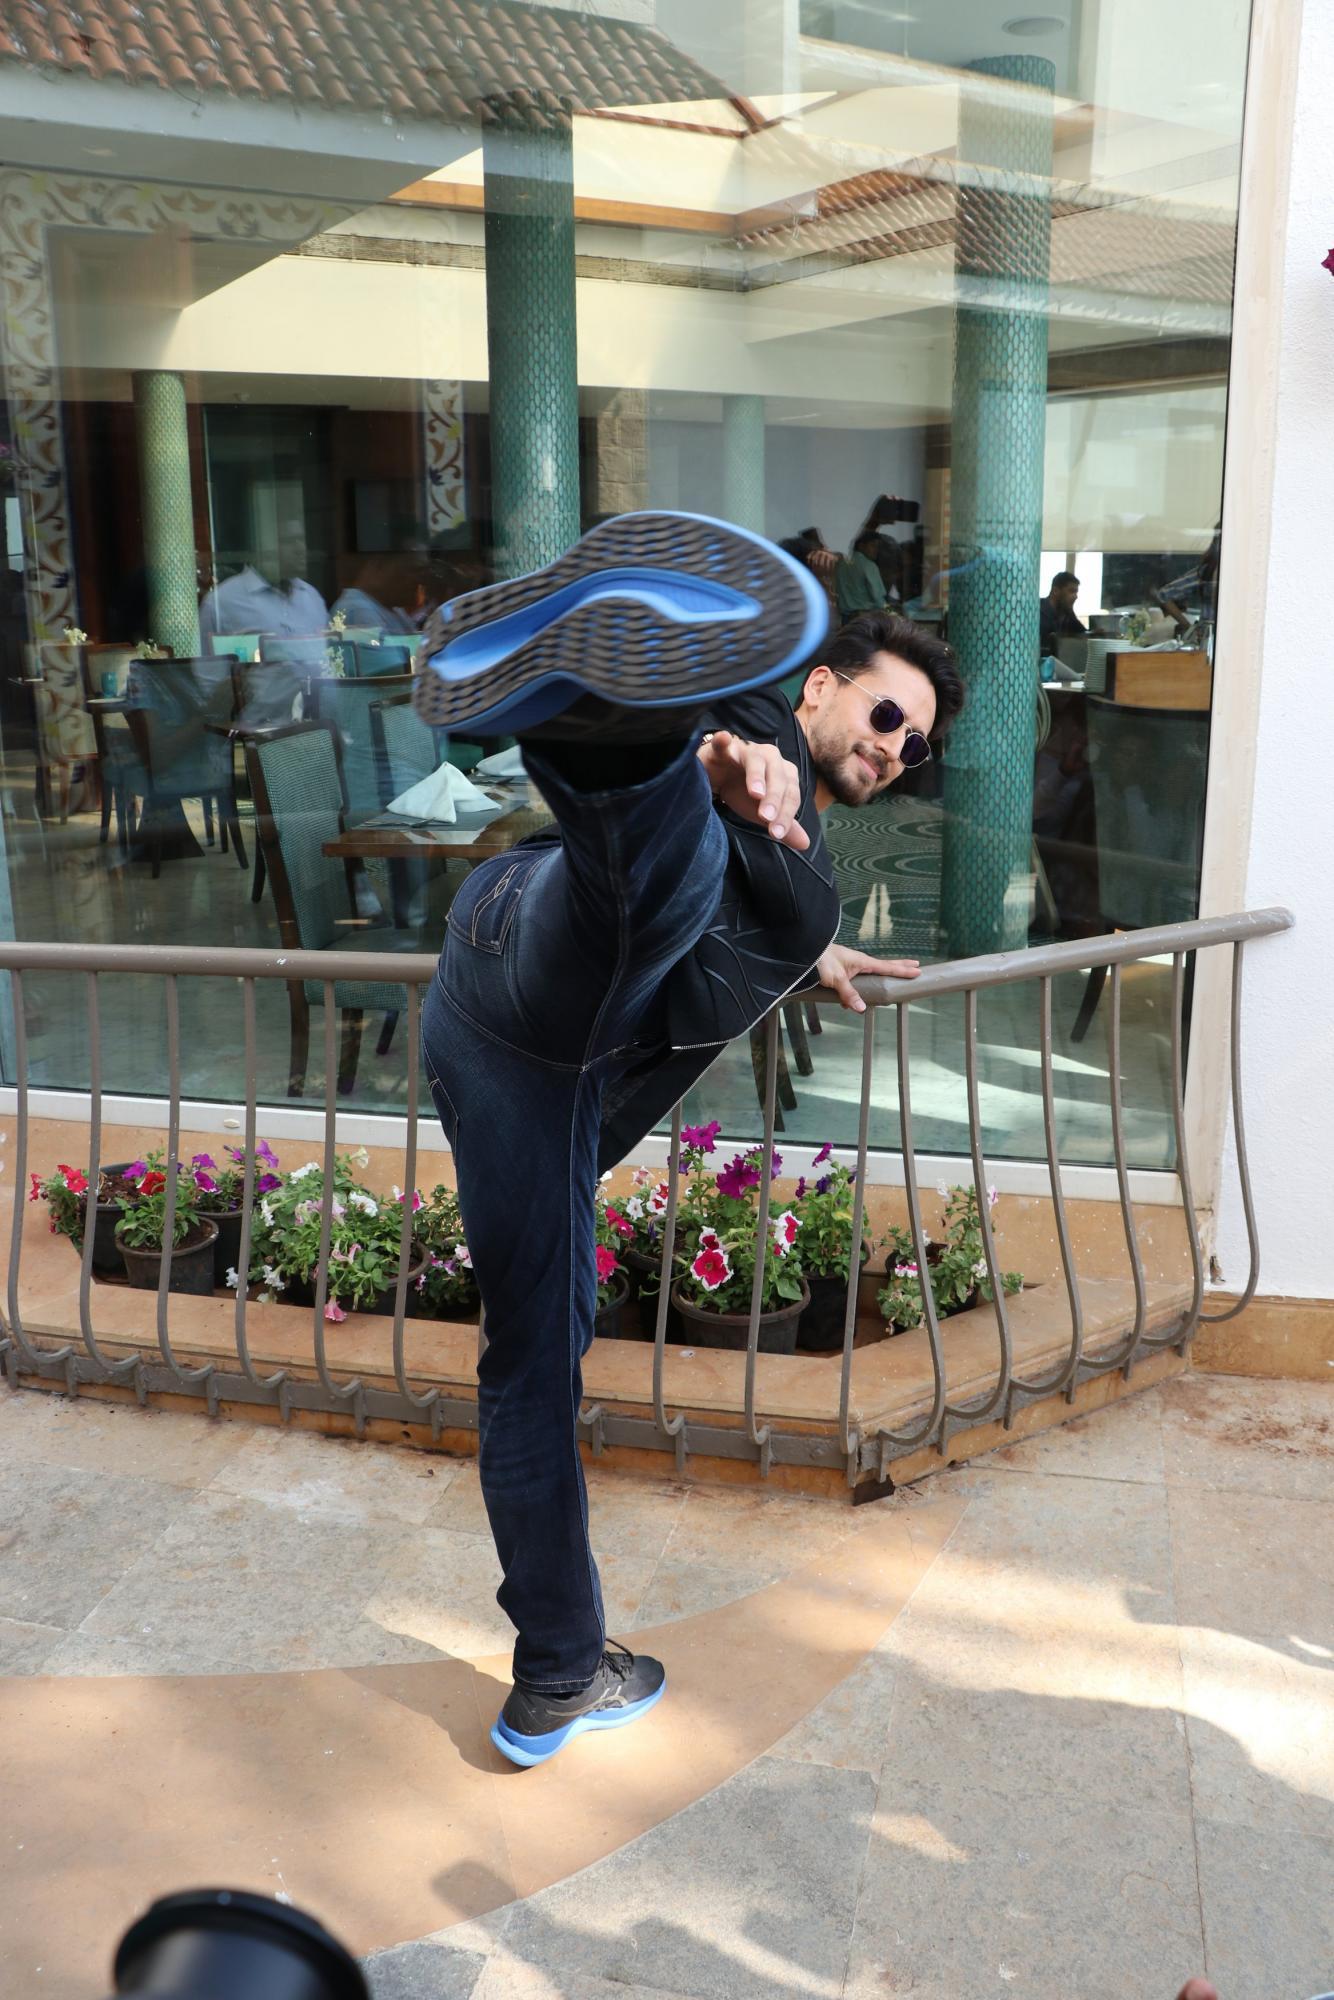 Tiger Shroff promoting Baaghi 3 in Dubai